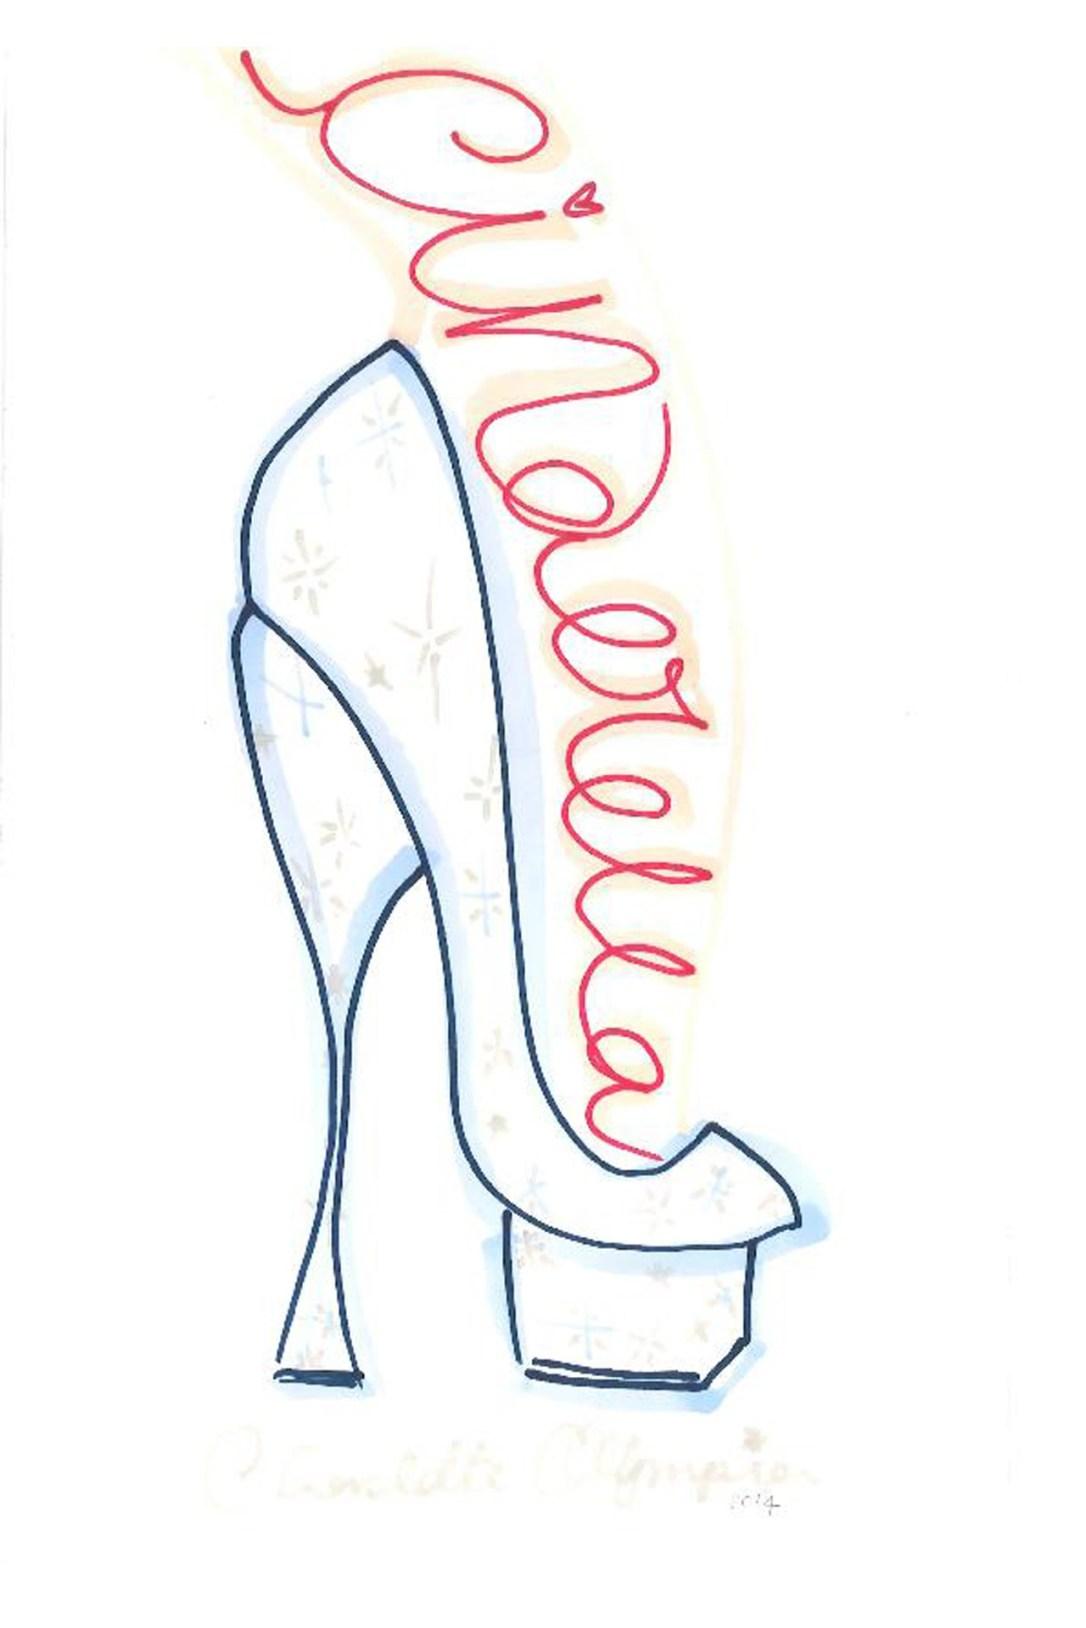 Charlotte-Olympia-Disney-Cinderella-Vogue-9Feb15-pr b a2fb0e7836a5